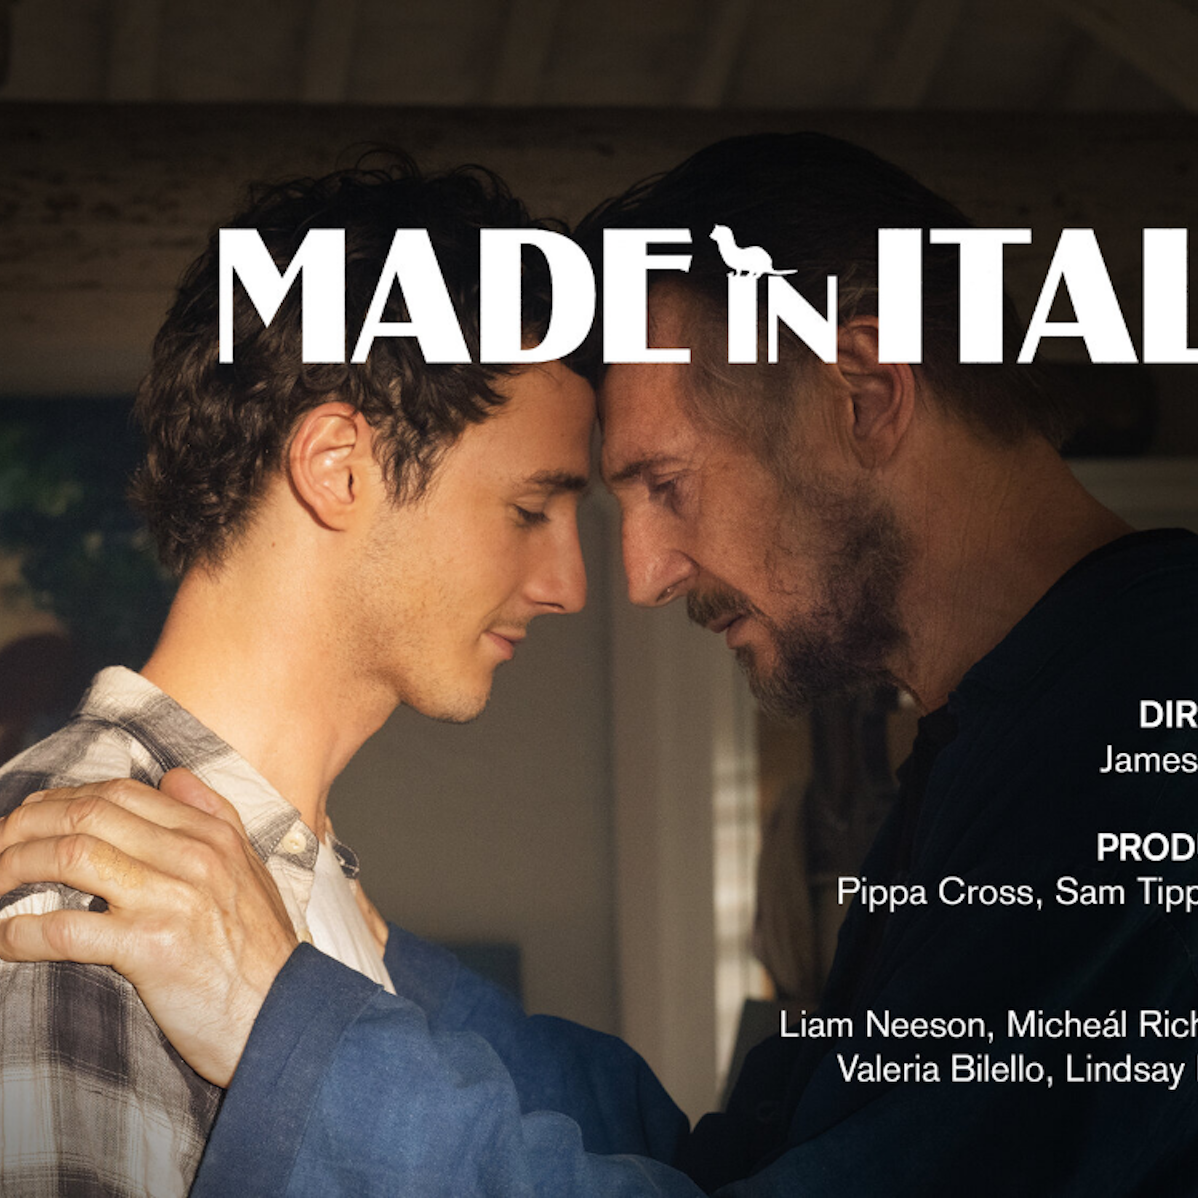 Made in Italy Κωμωδία με τον Liam Neeson - Ardan Movies